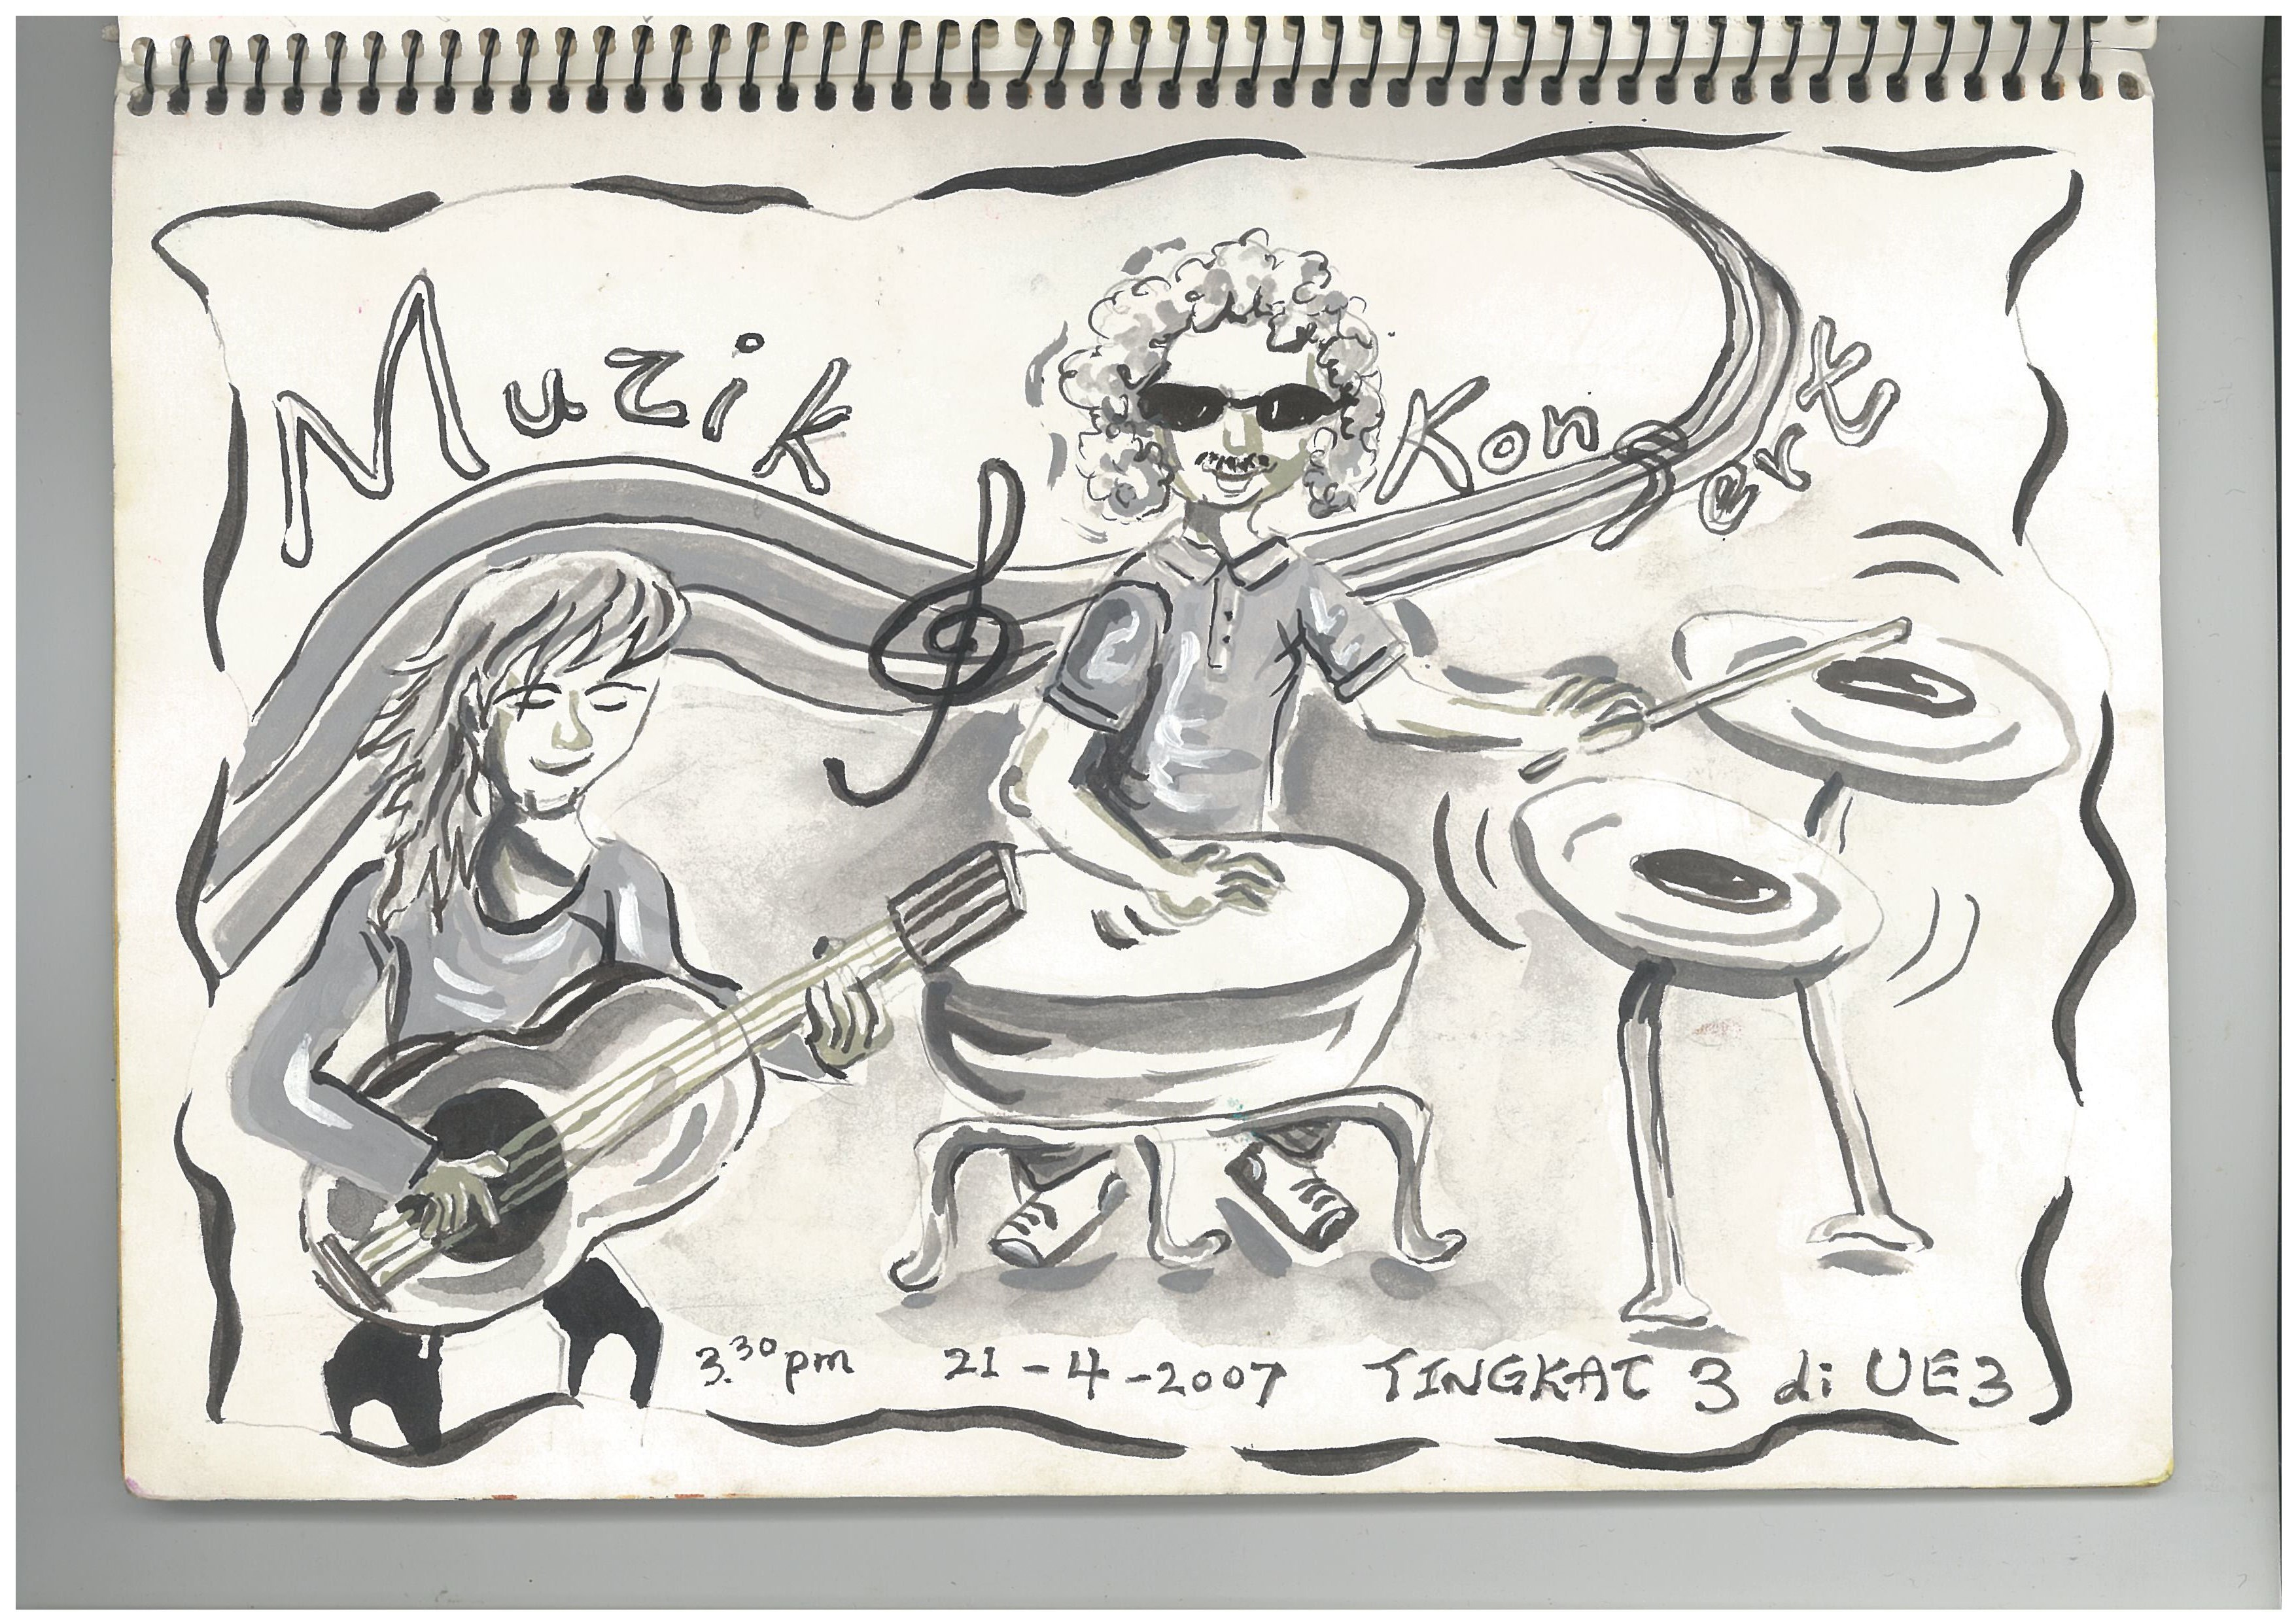 j.music concert